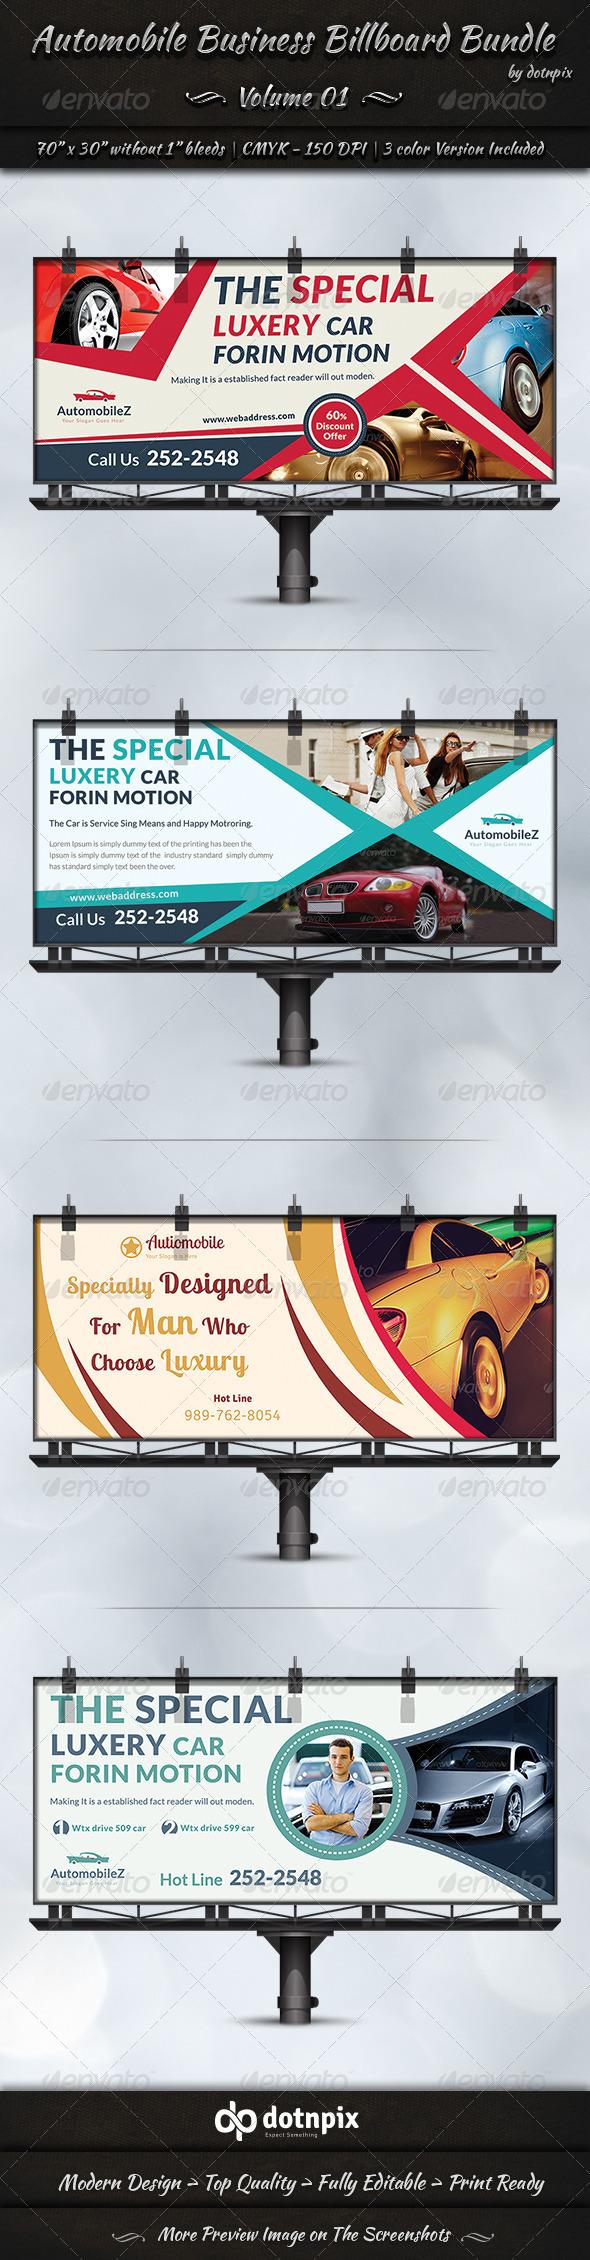 GraphicRiver Automobile Business Billboard Bundle Volume 1 7095094